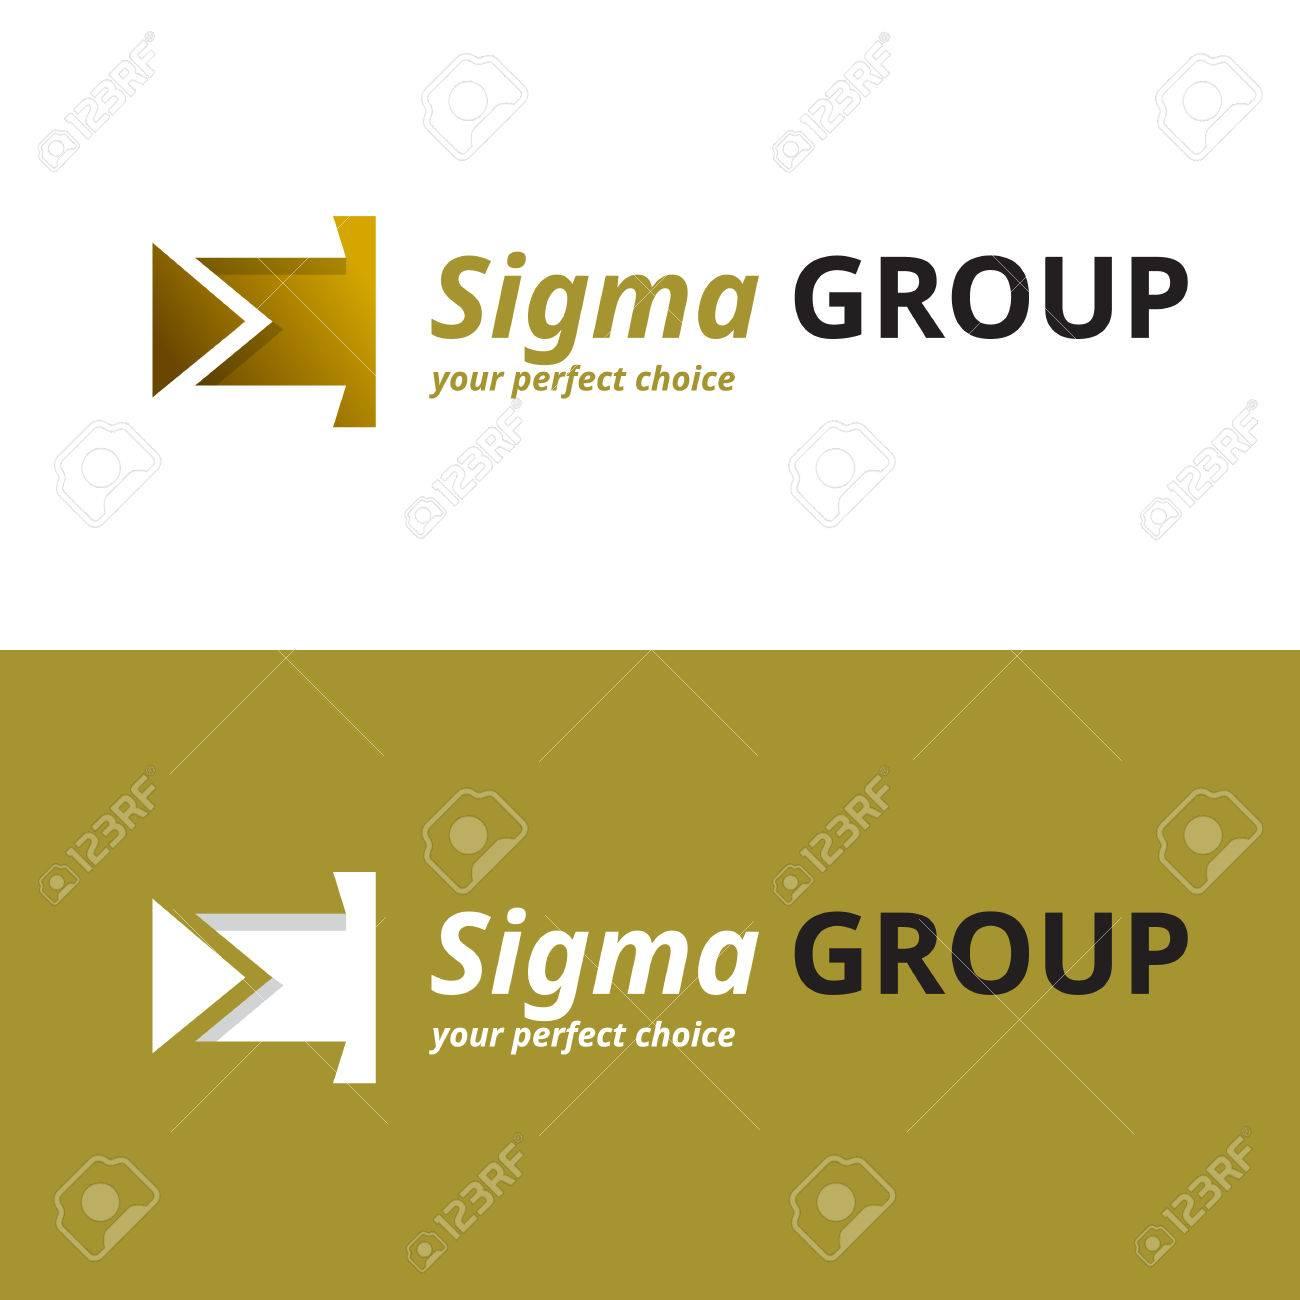 Vector minimalistic negative space greek letter logo sigma letter vector minimalistic negative space greek letter logo sigma letter symbol stock vector 55495538 biocorpaavc Choice Image